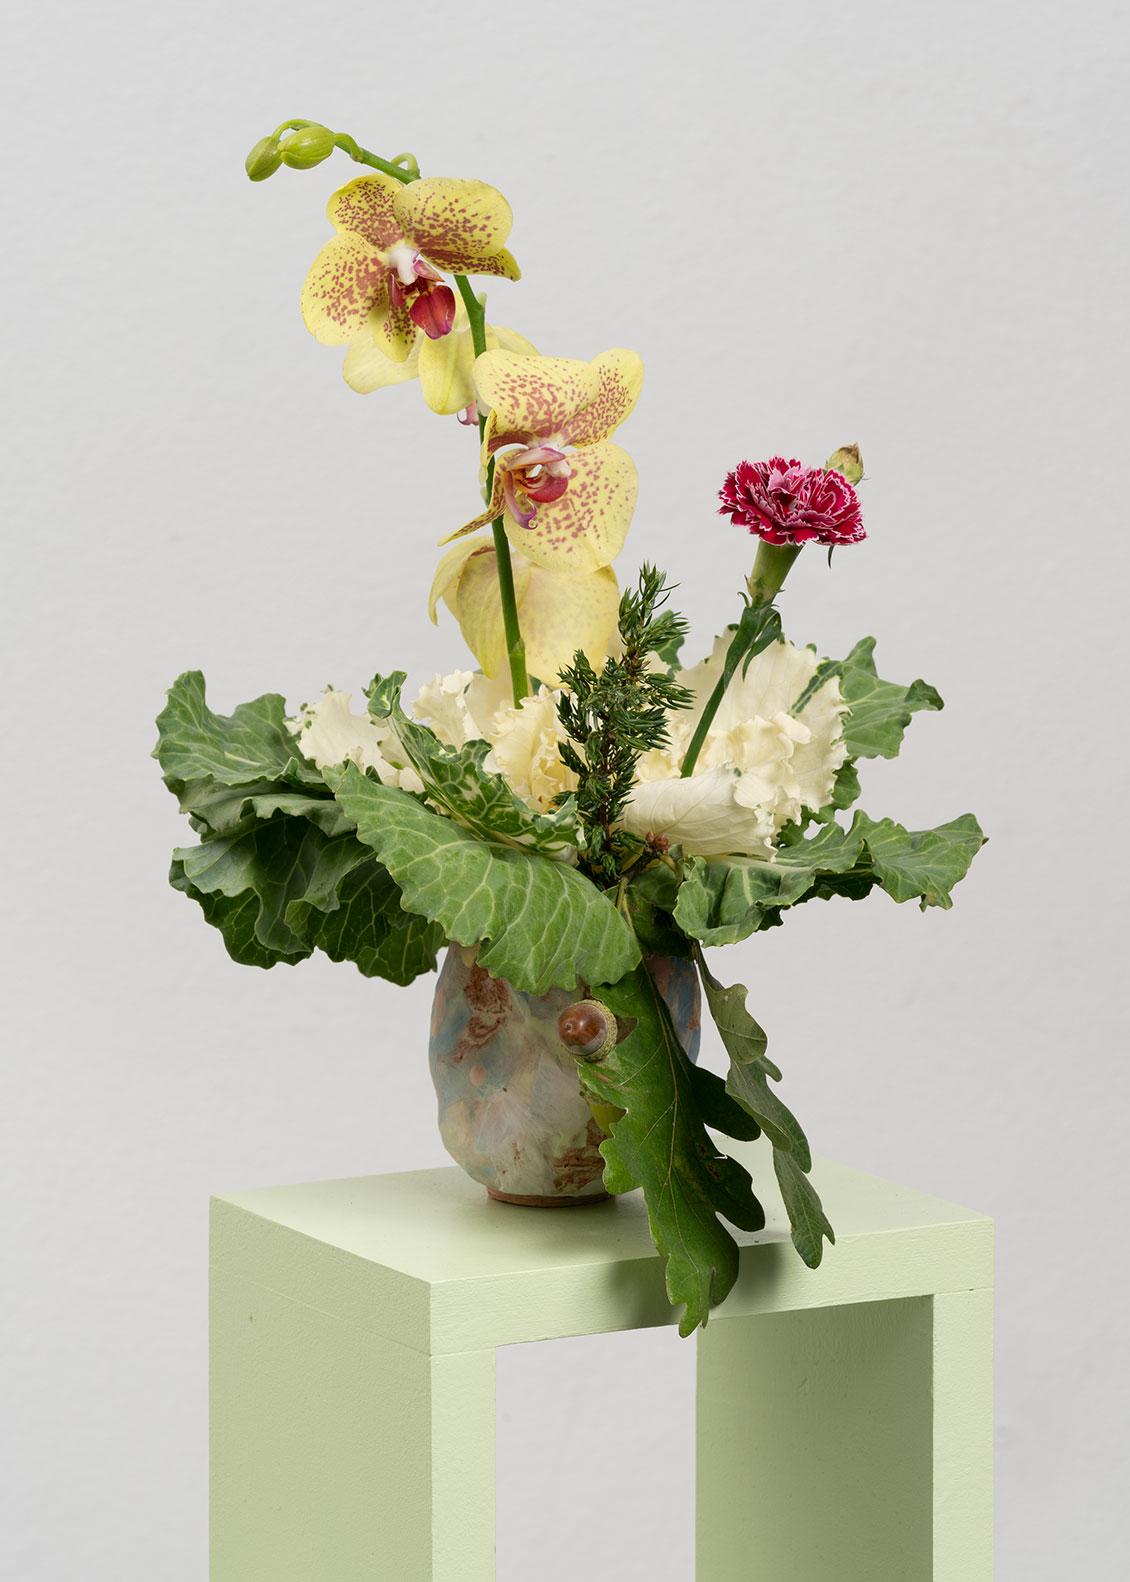 Emilia Bergmark, Abstract Container (The Cost of Living), 2020. Courtesy kunstneren. Foto: David Stjernholm